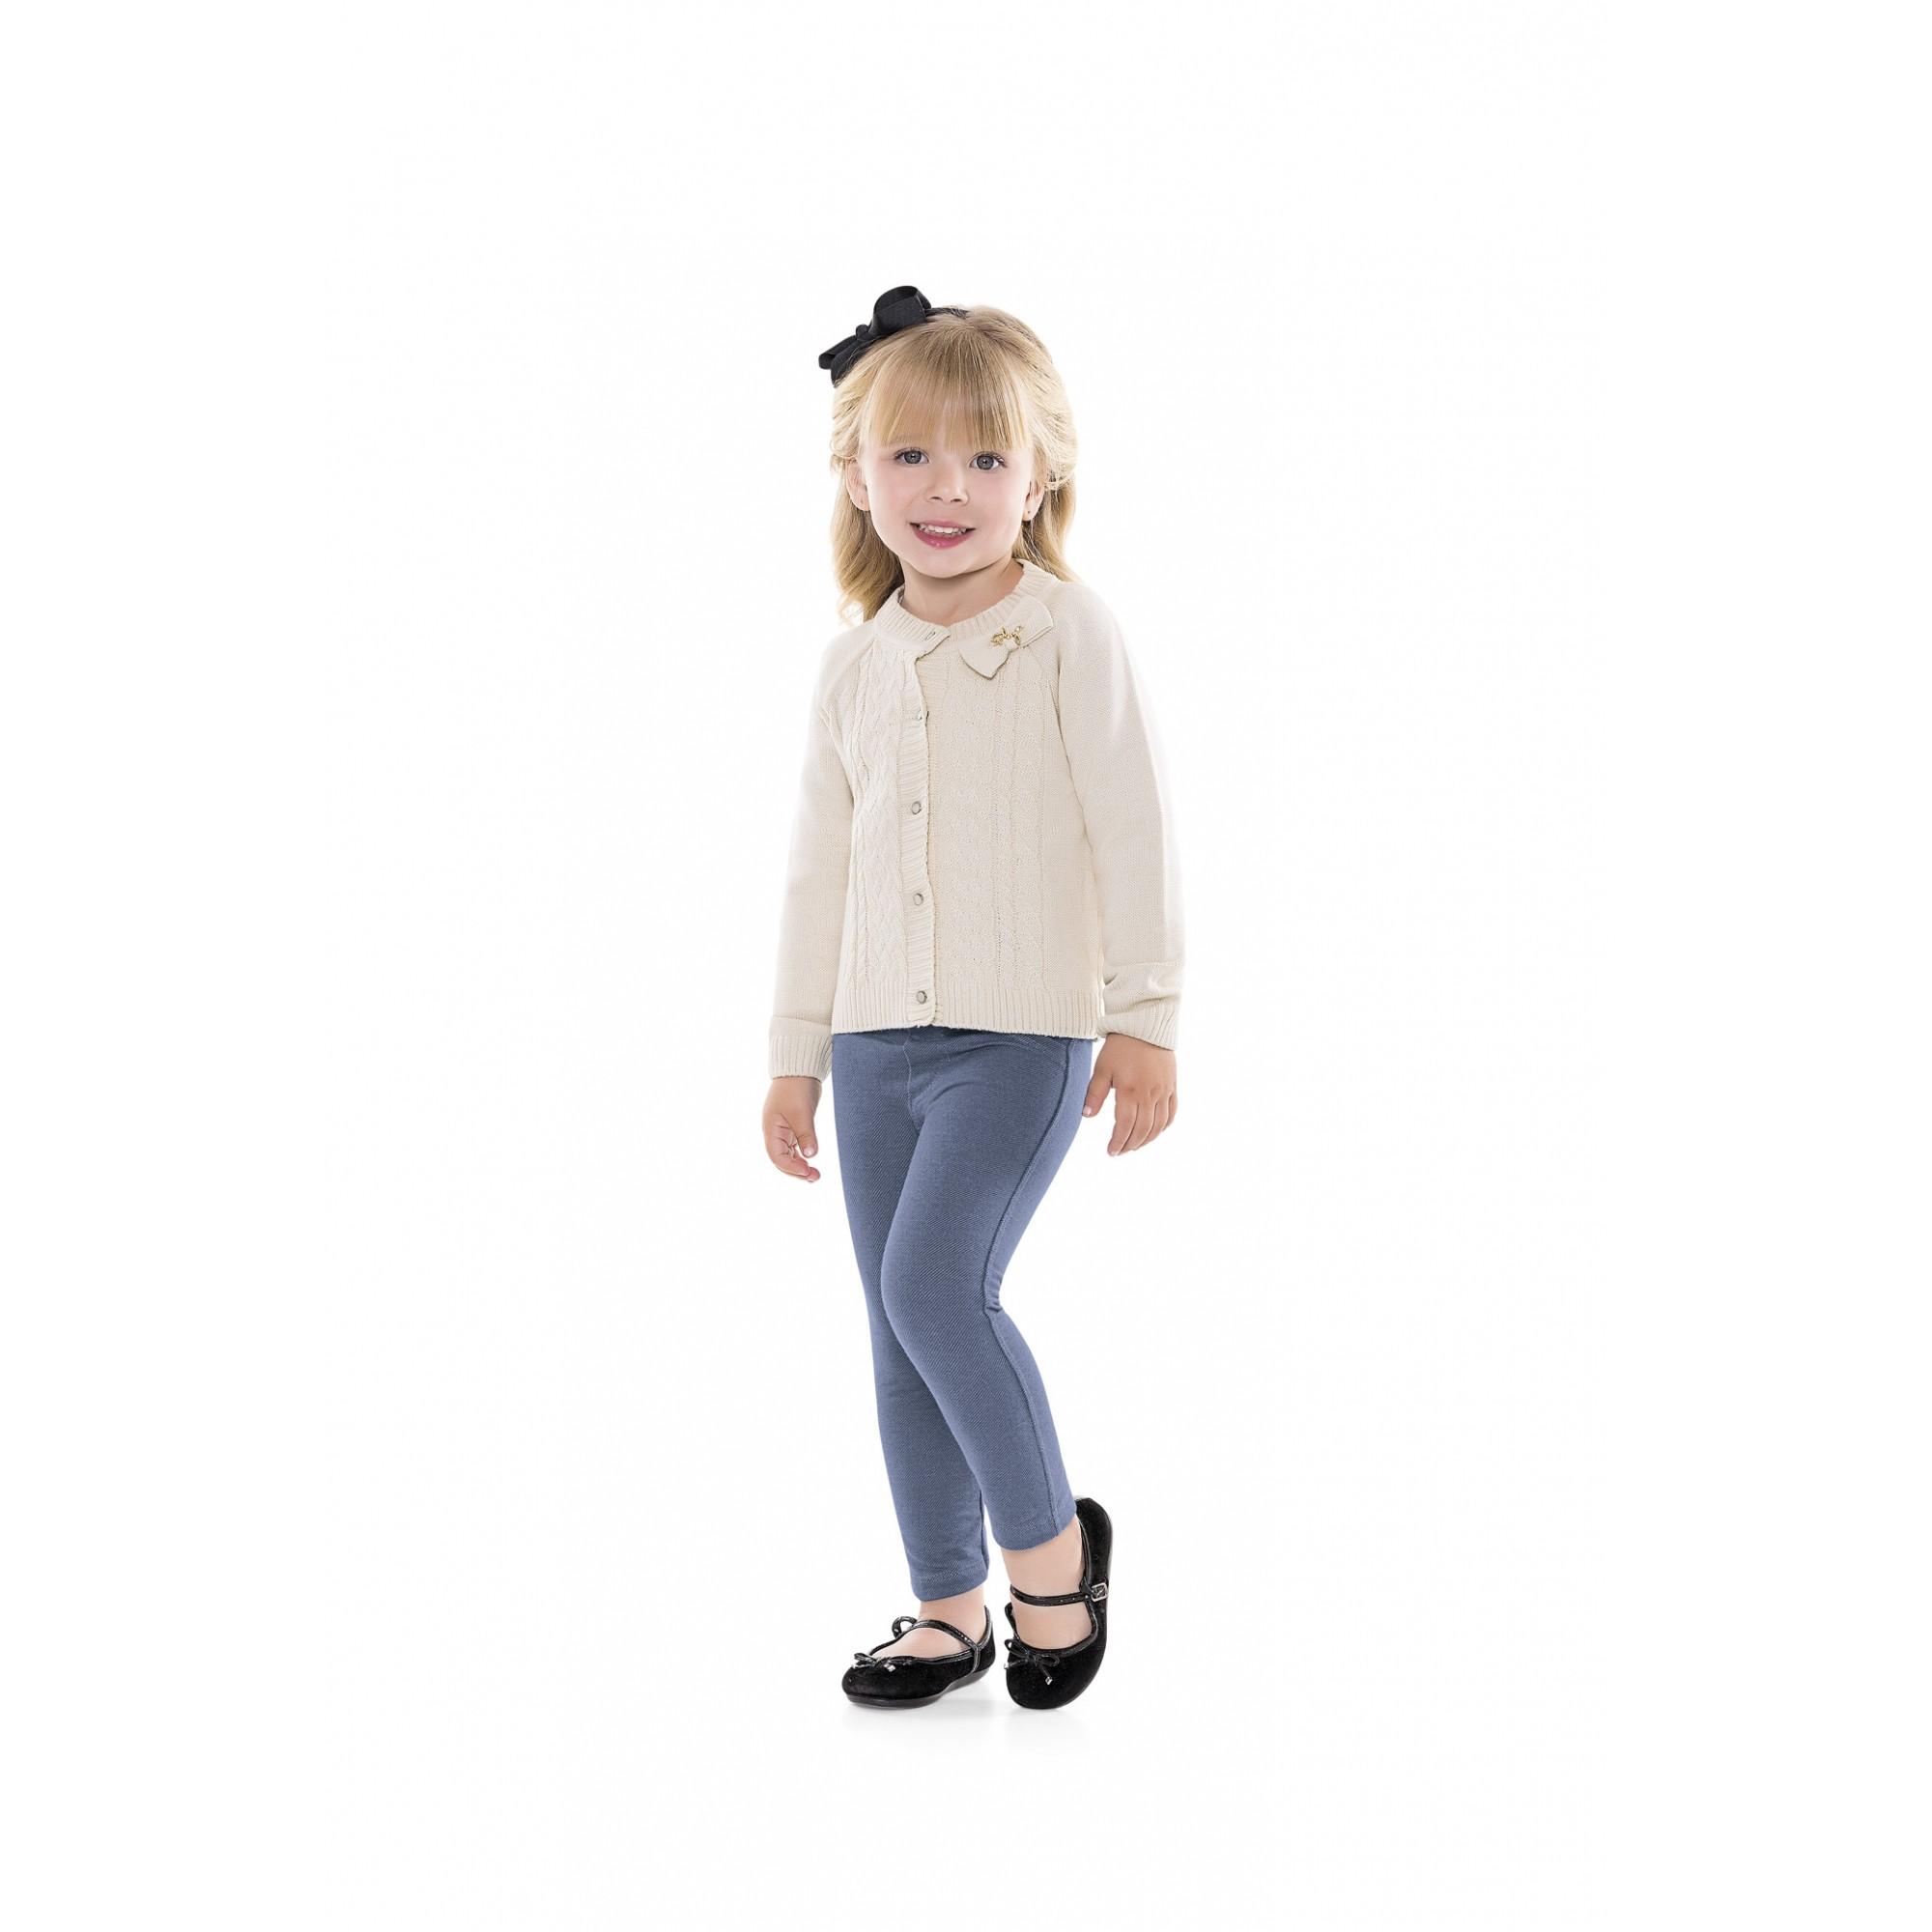 Calça infantil feminina legging jeans em malha Playground